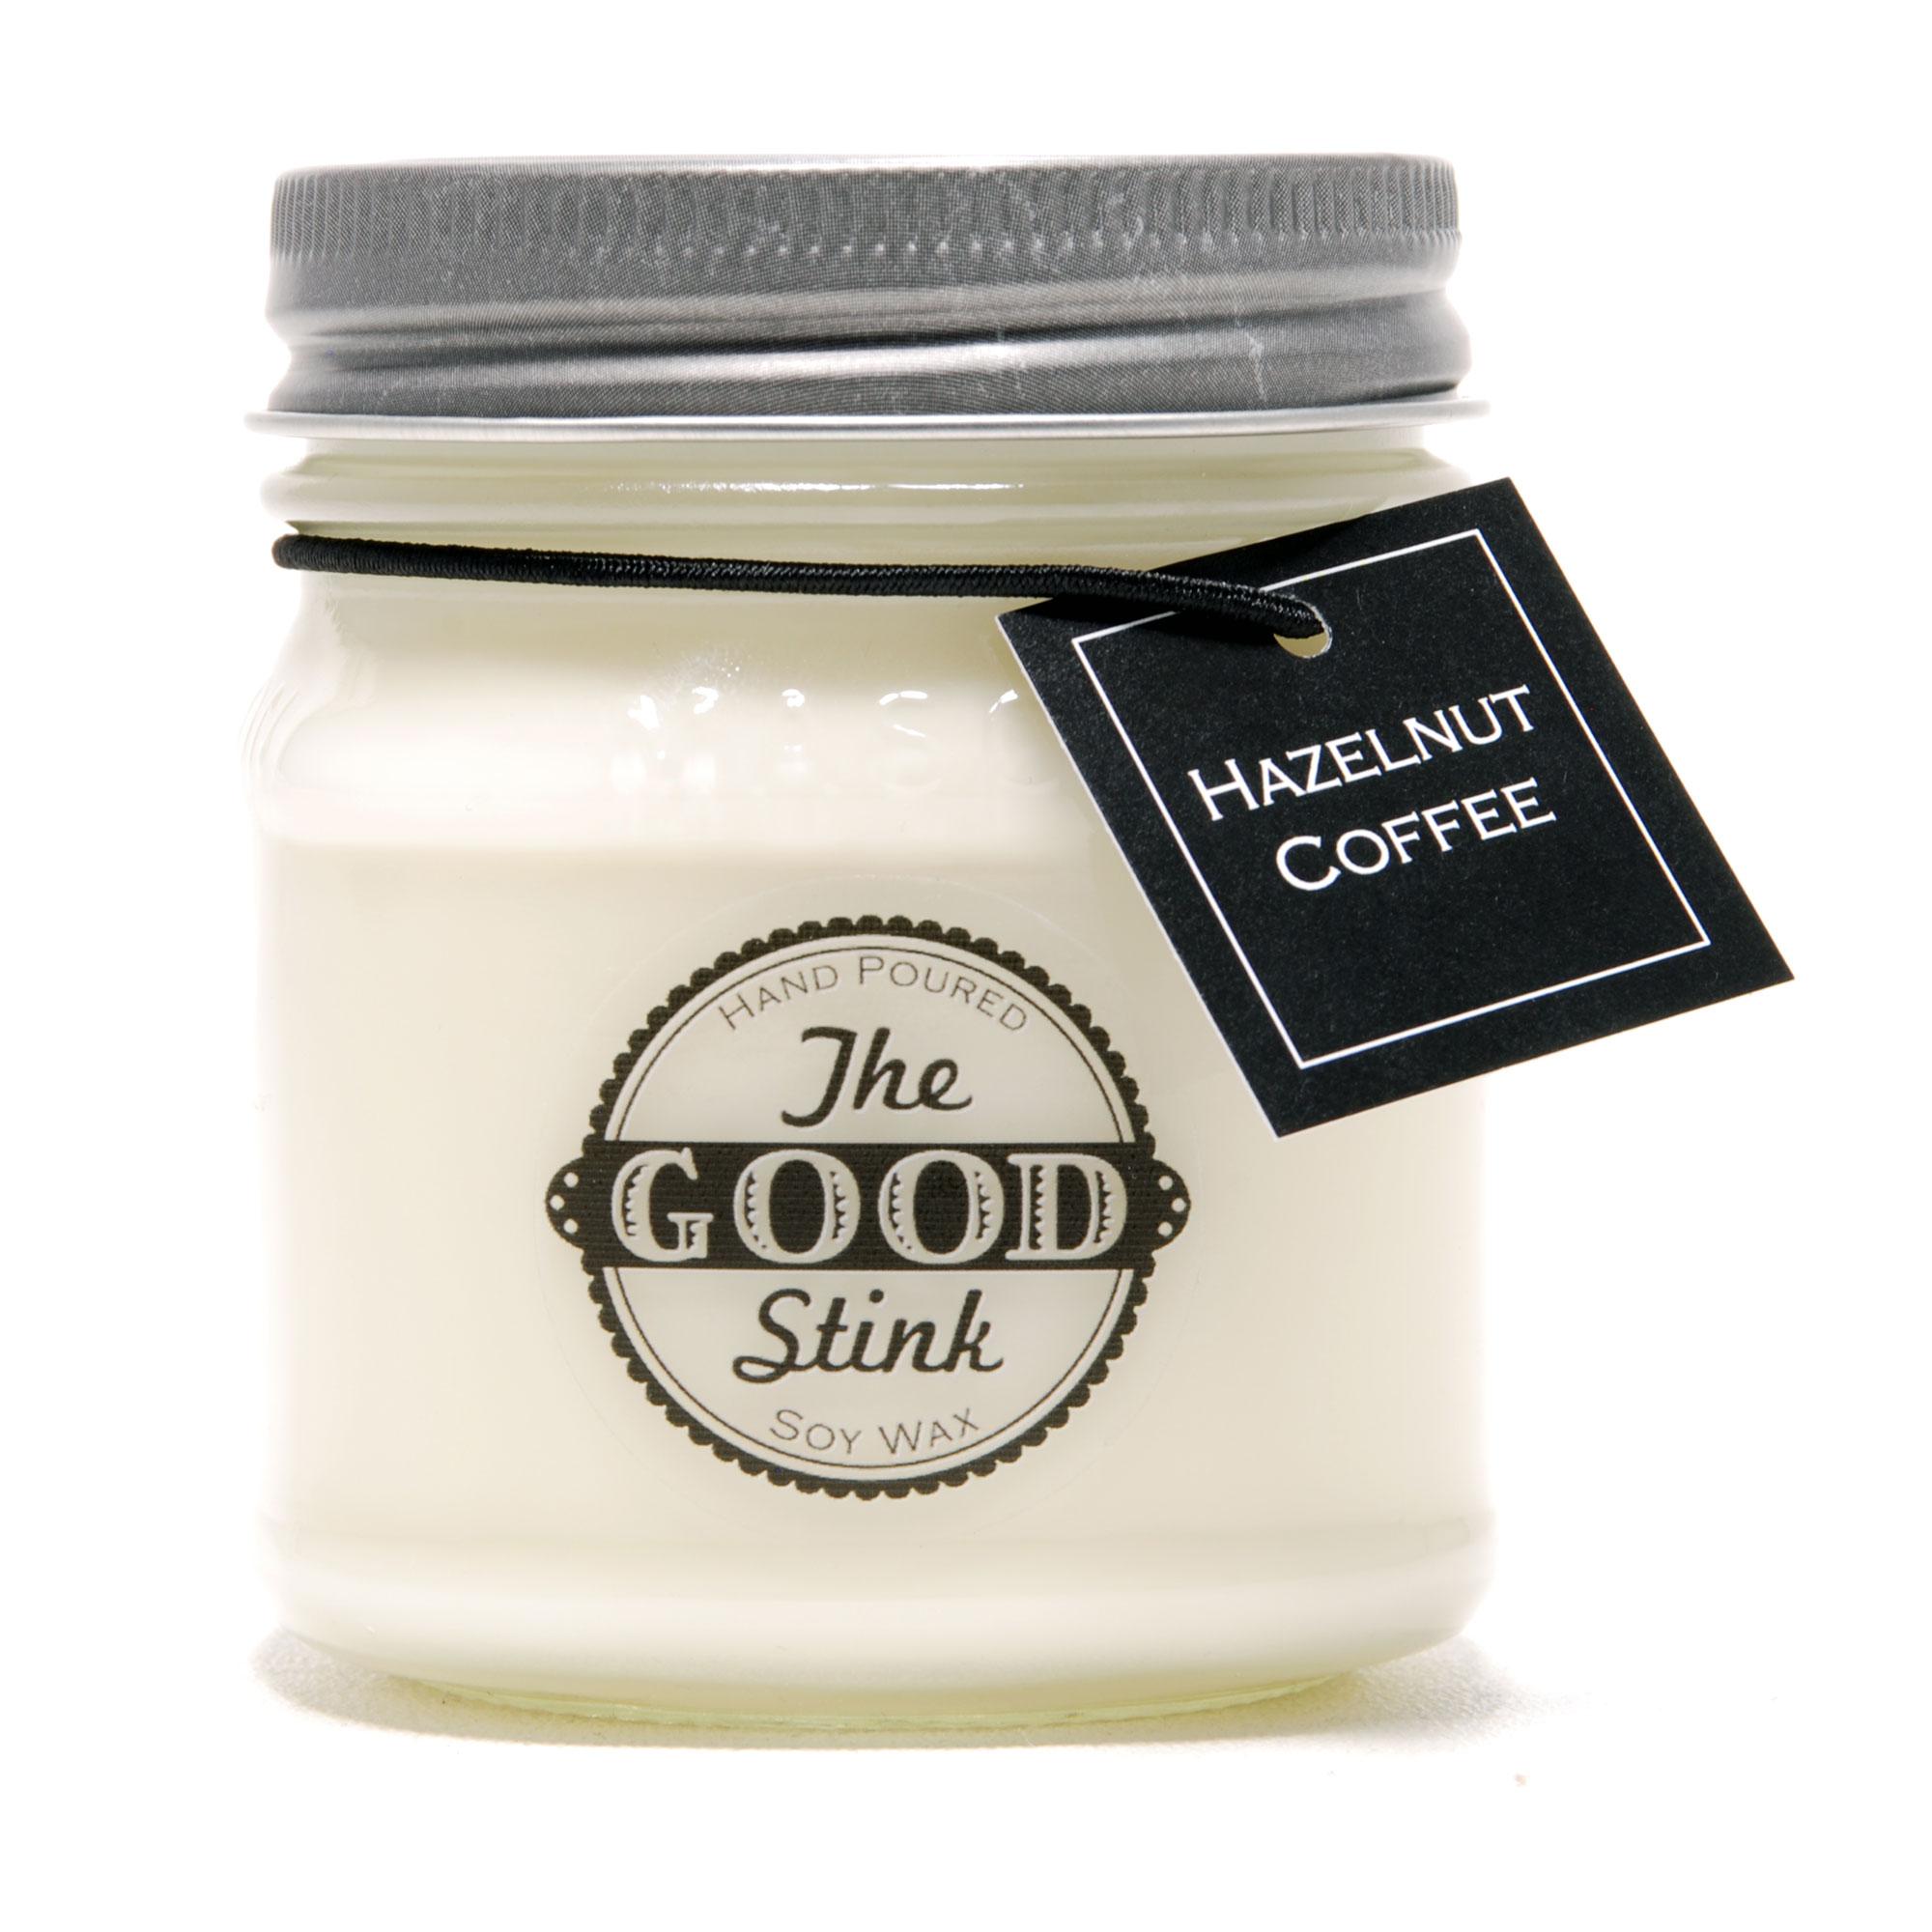 Soy Candle - Hazelnut Coffee - The Good Stink Original Stinker